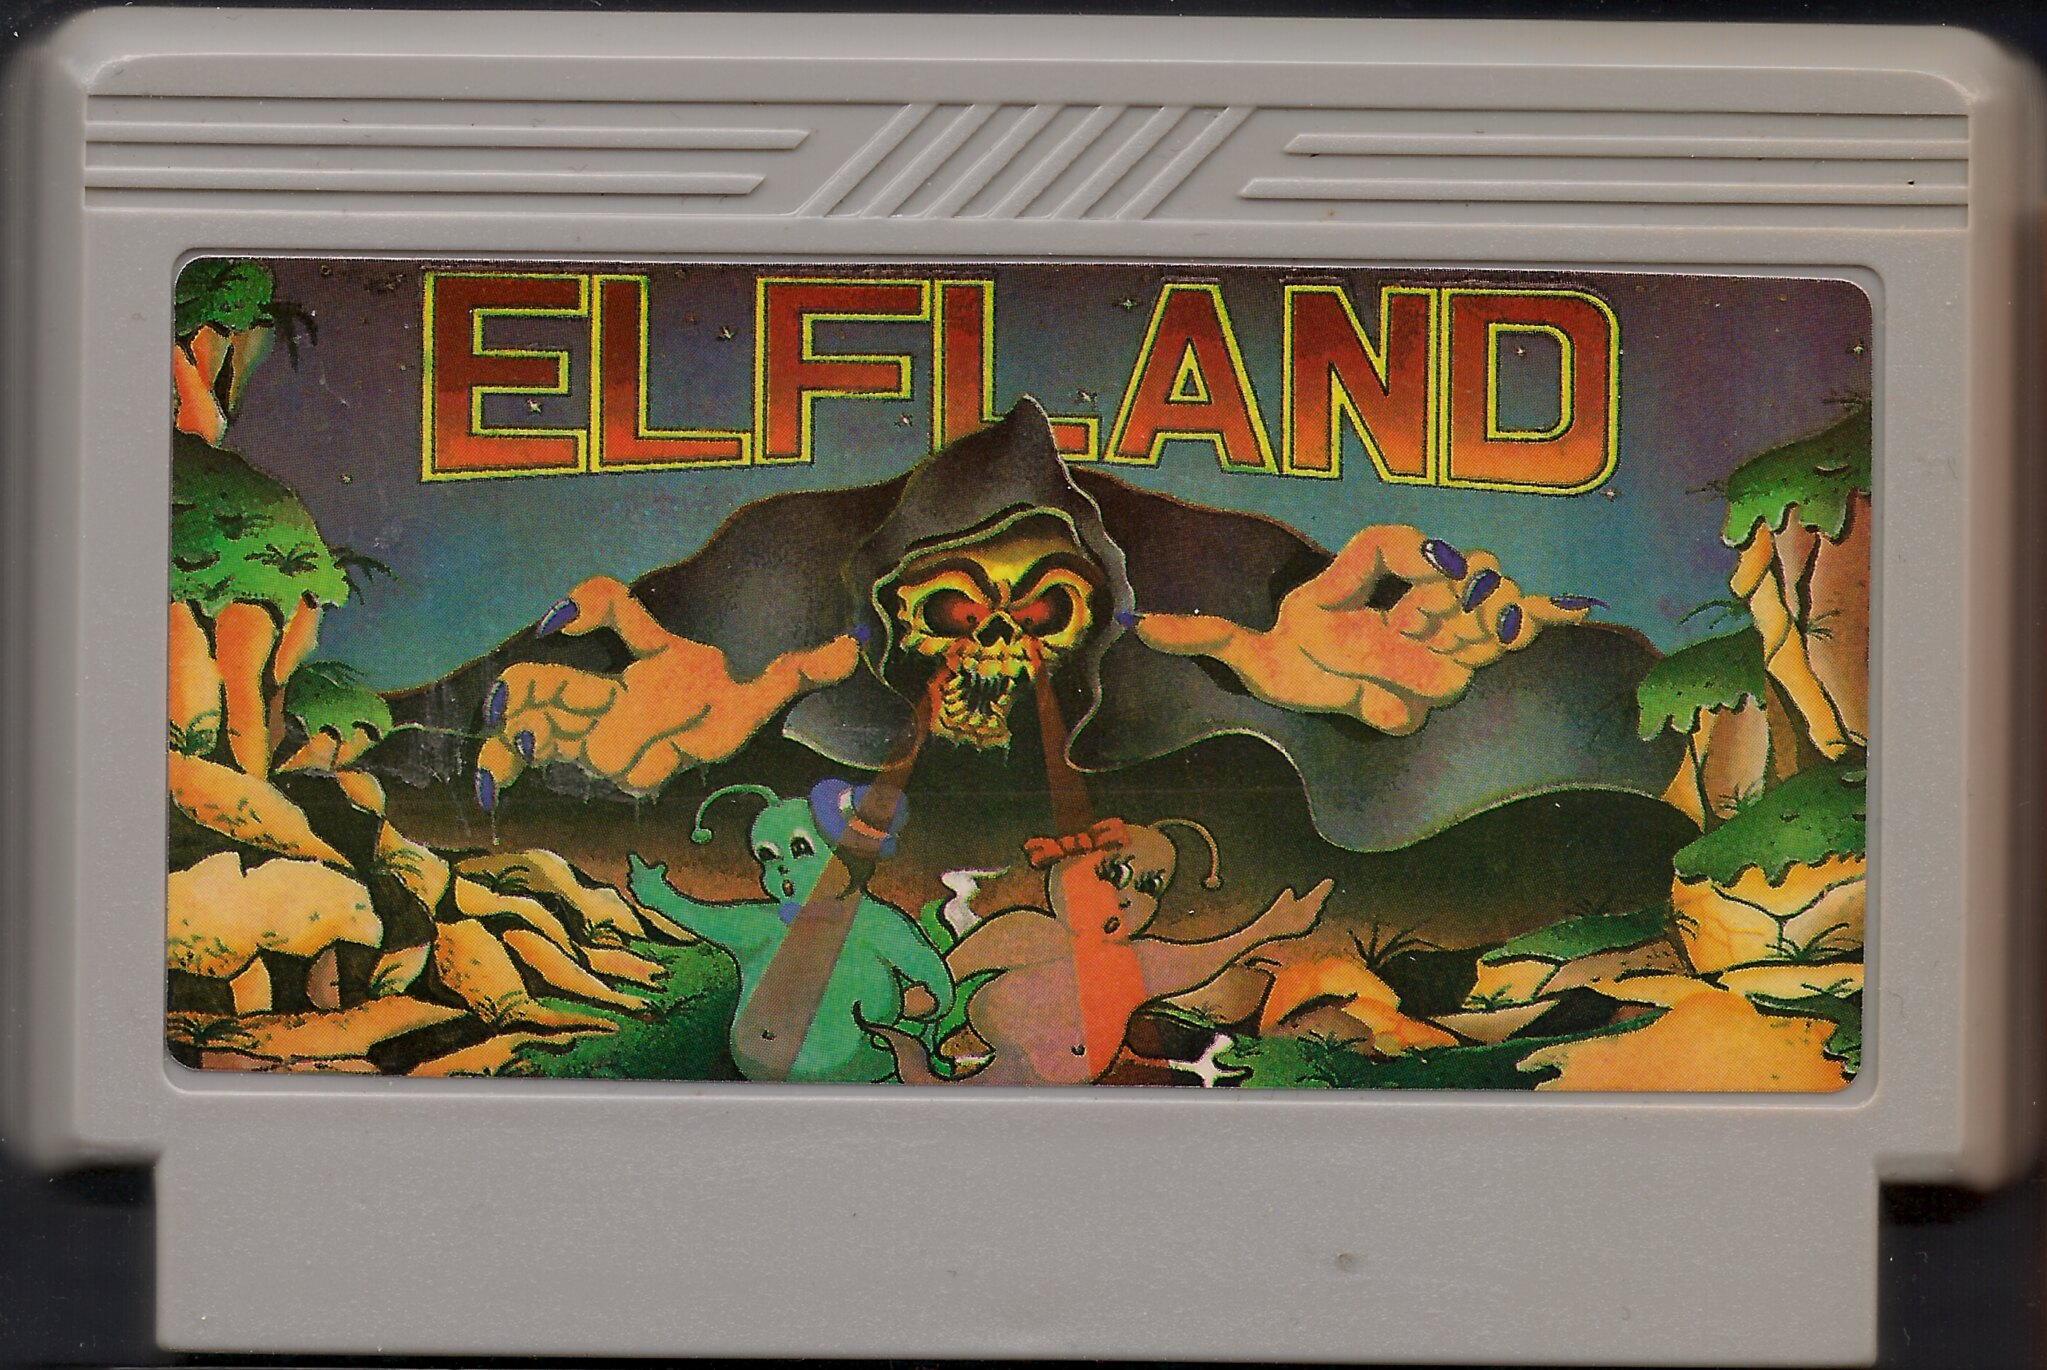 File:Elfland.jpg